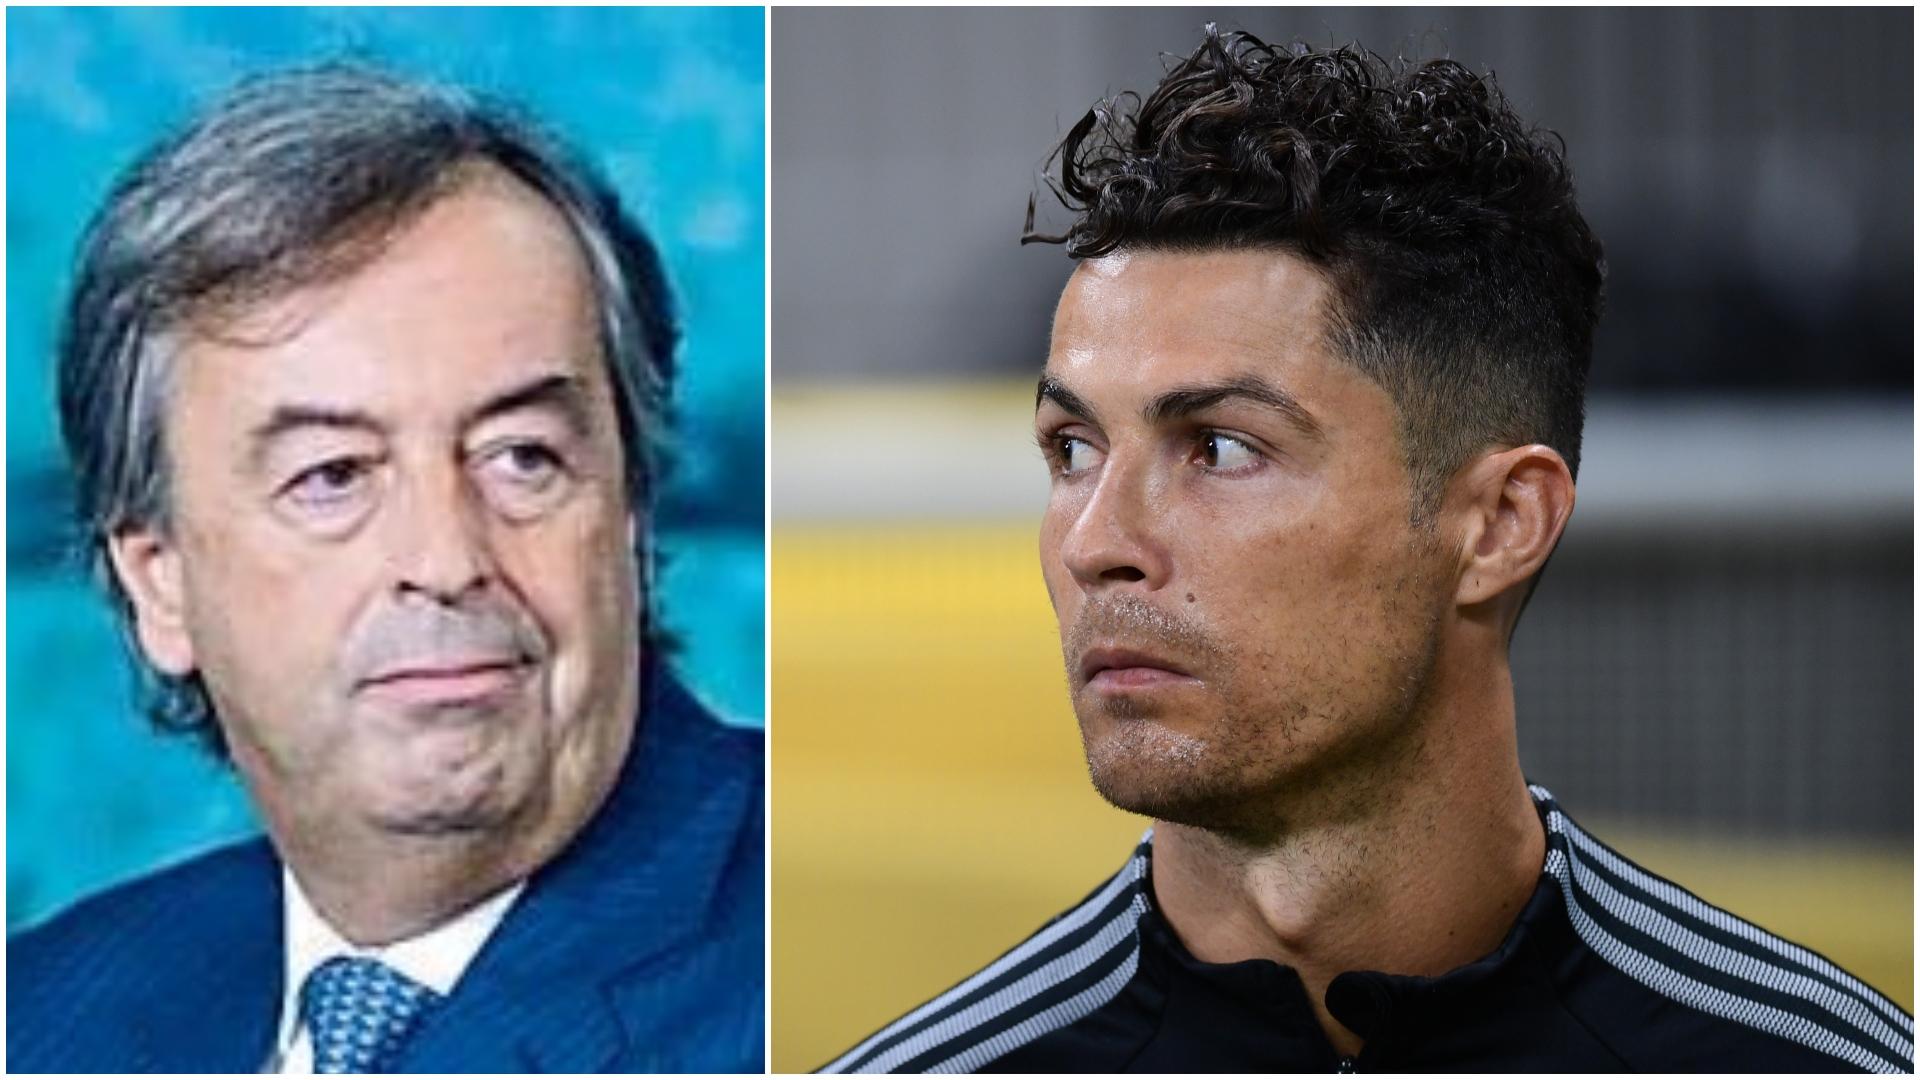 Il tweet di Ronaldo fa infuriare Burioni